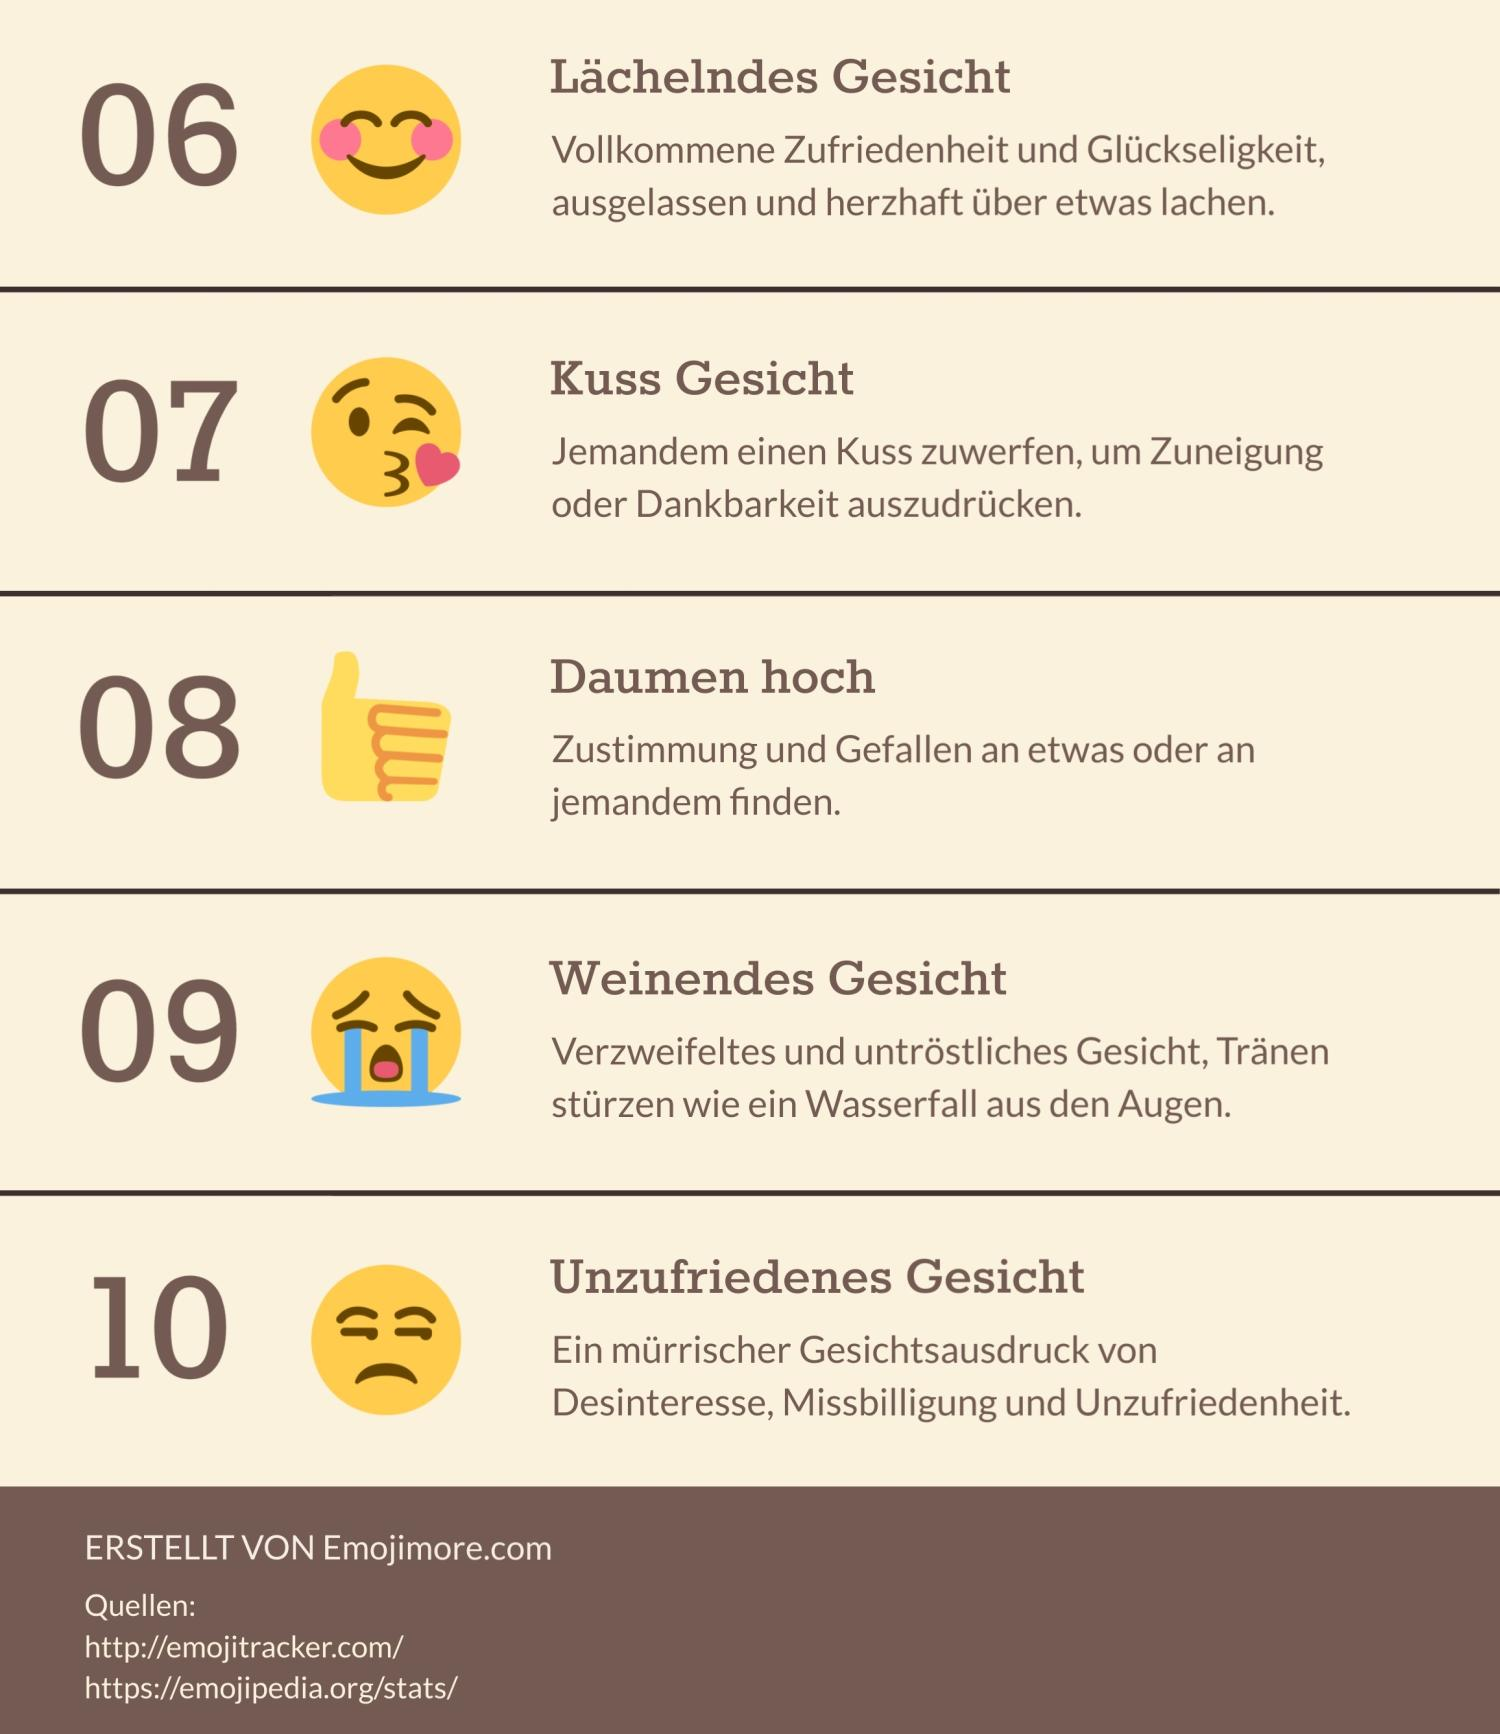 10 beliebteste emojis 2